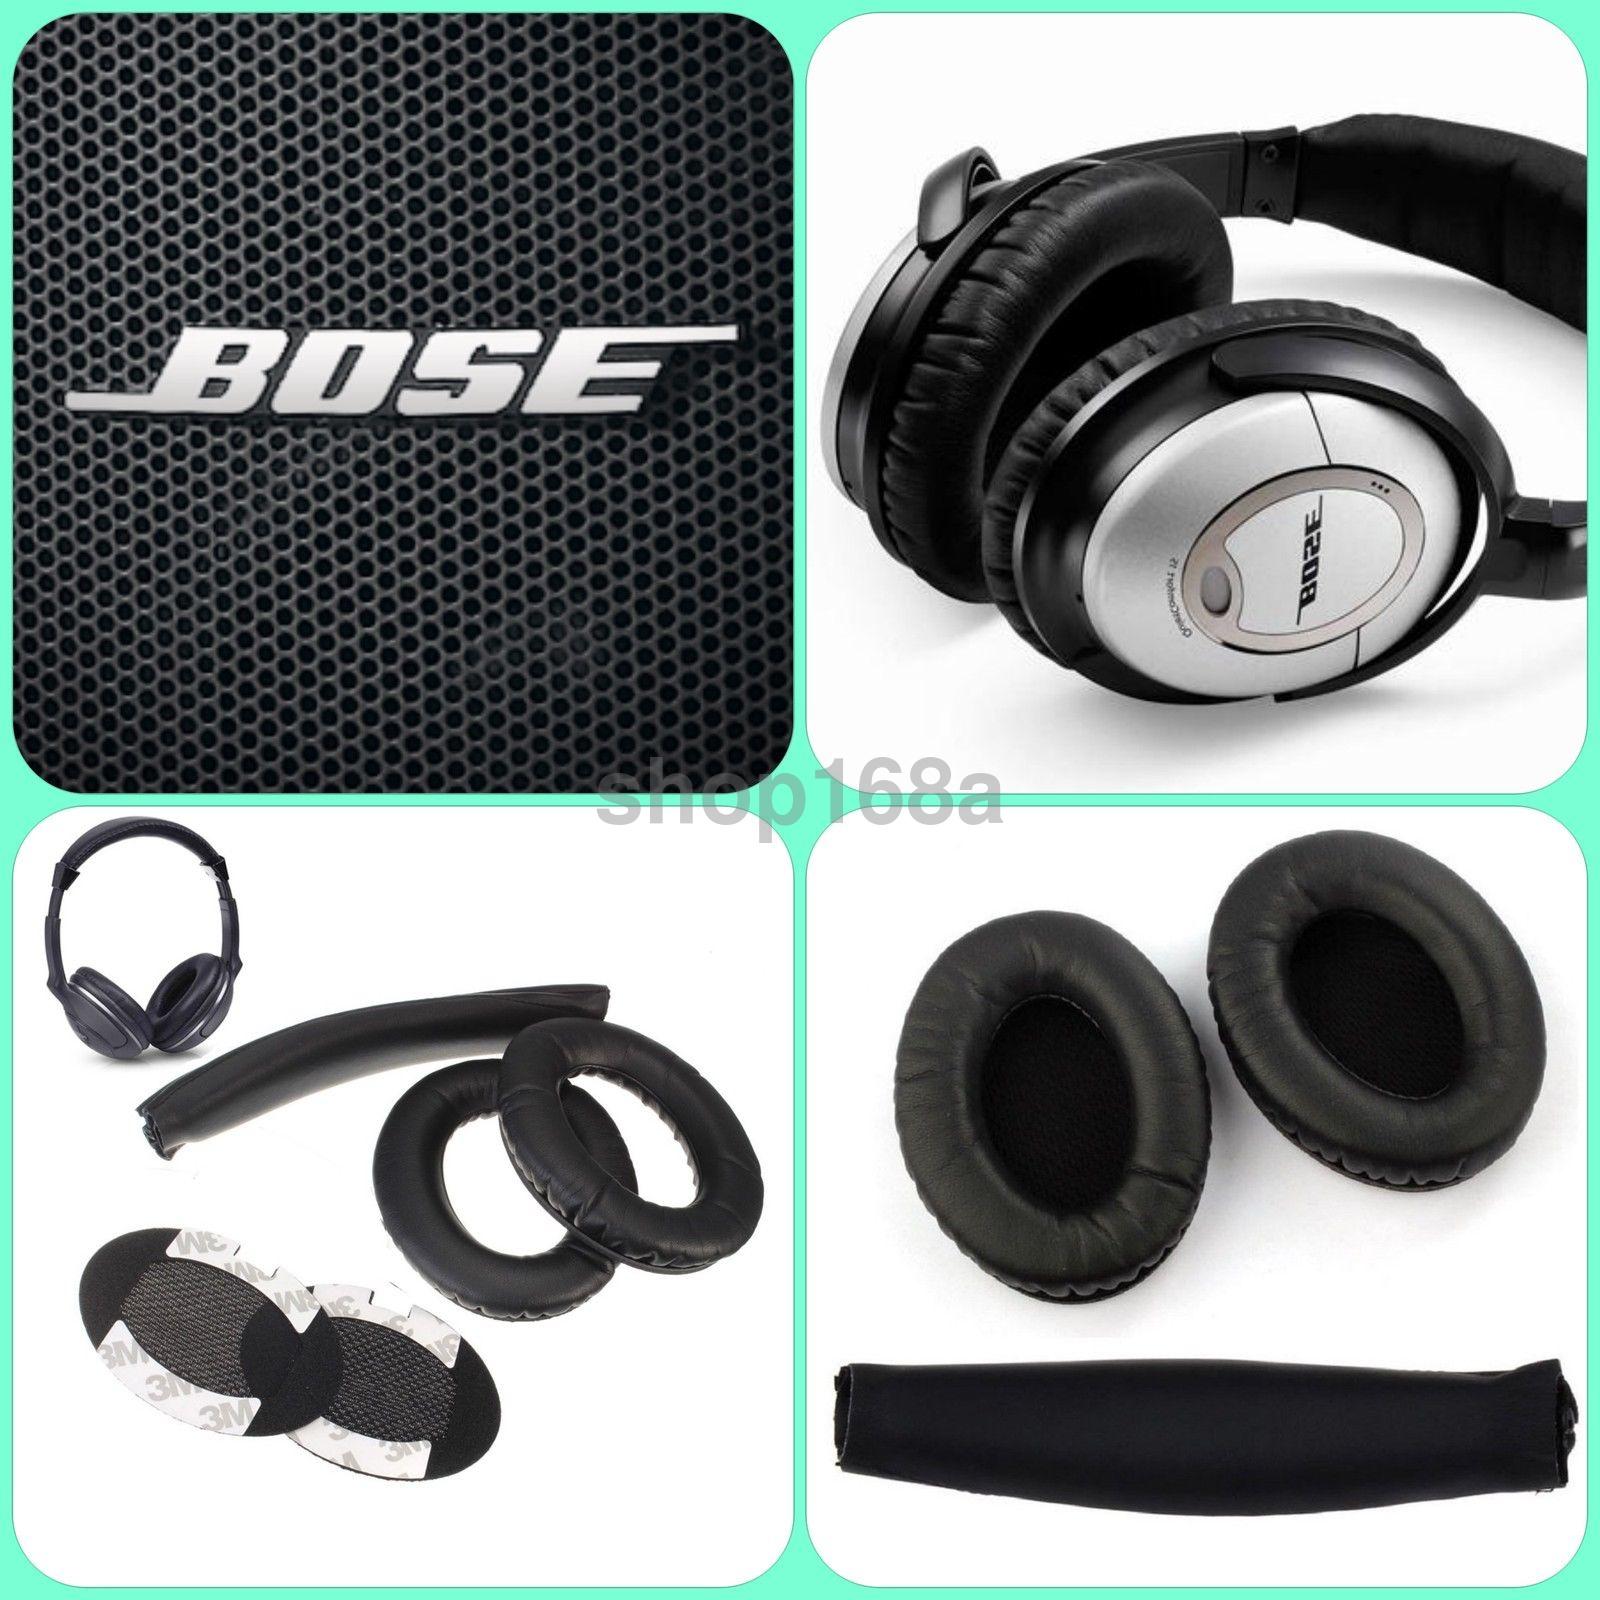 EEEKit Pair Replacement Ear Pads Cushions for Bose Quietcomfort QC AE Headphones